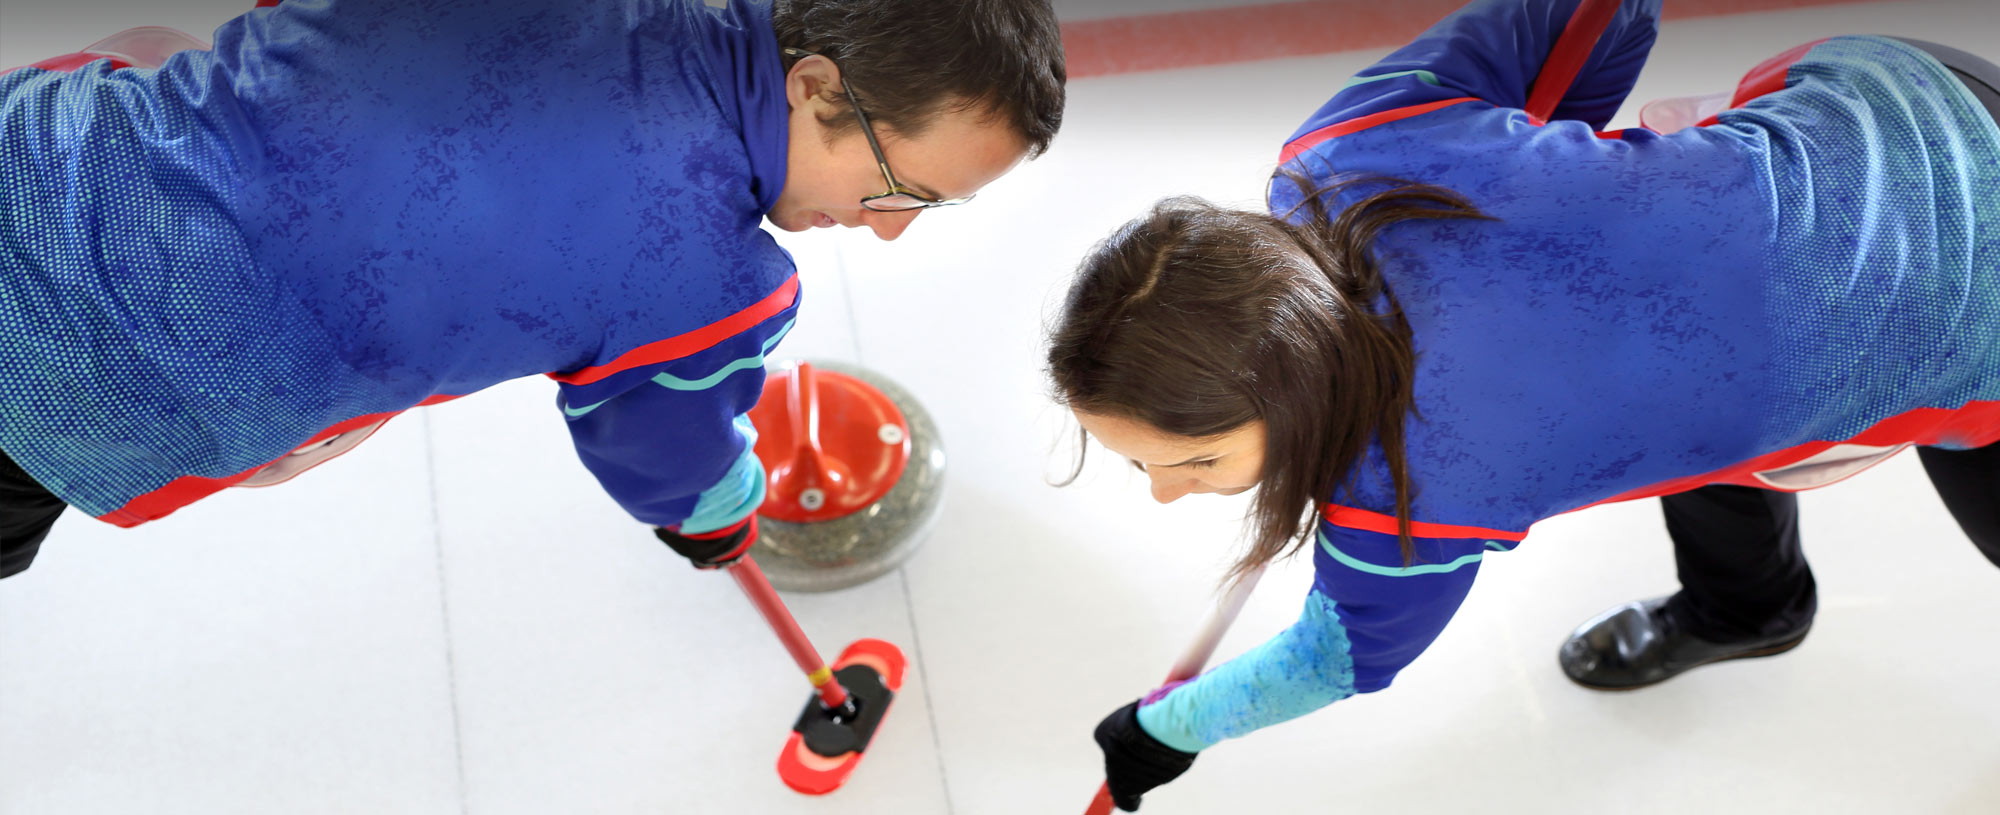 curling chatham 2 2